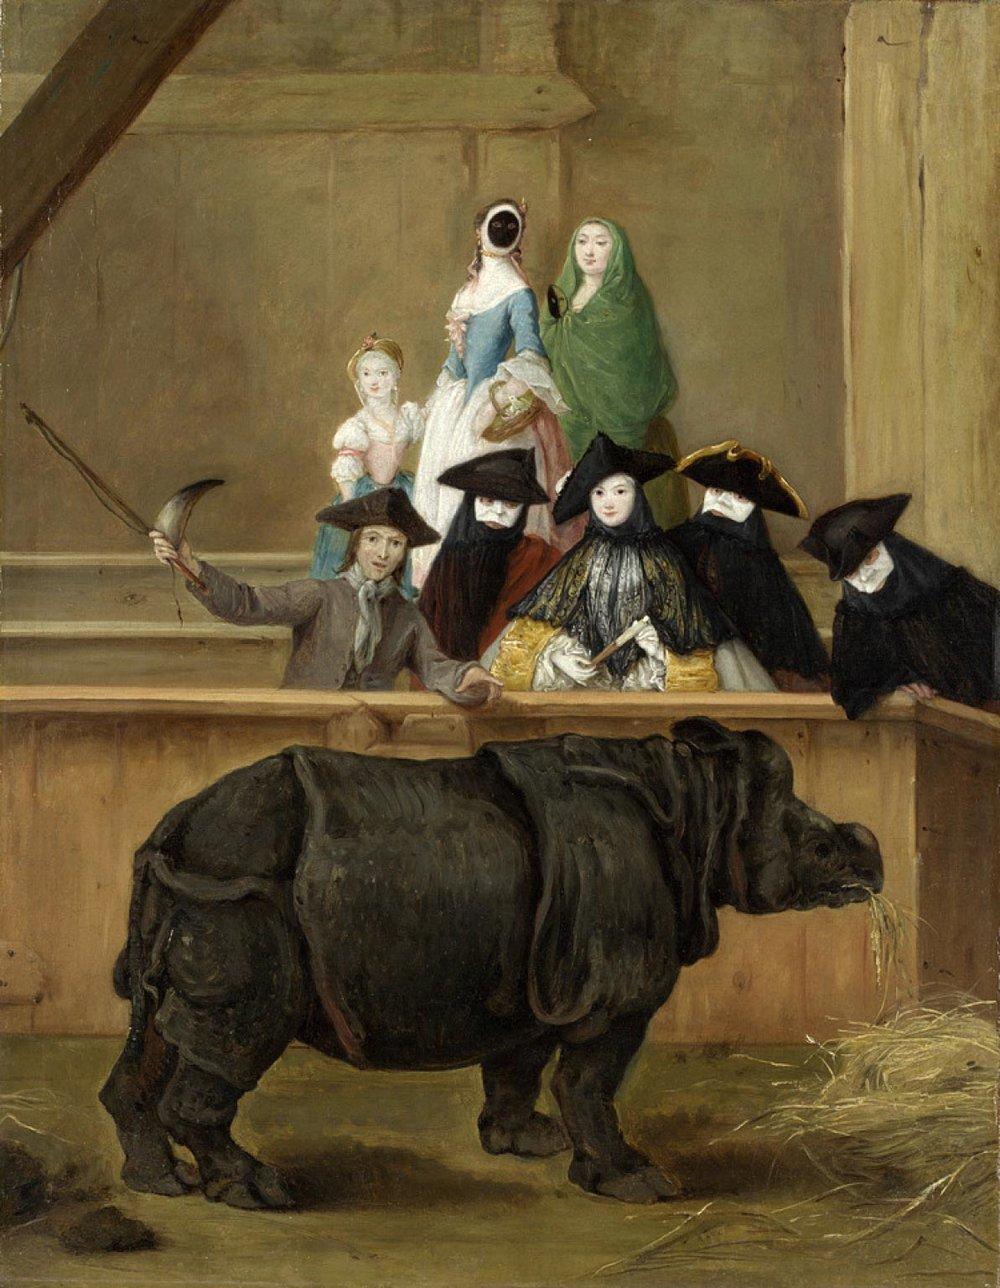 Pietro Longhi, Clara the Rhinoceros, 1751  (Ca' Rezzonico, Venice)